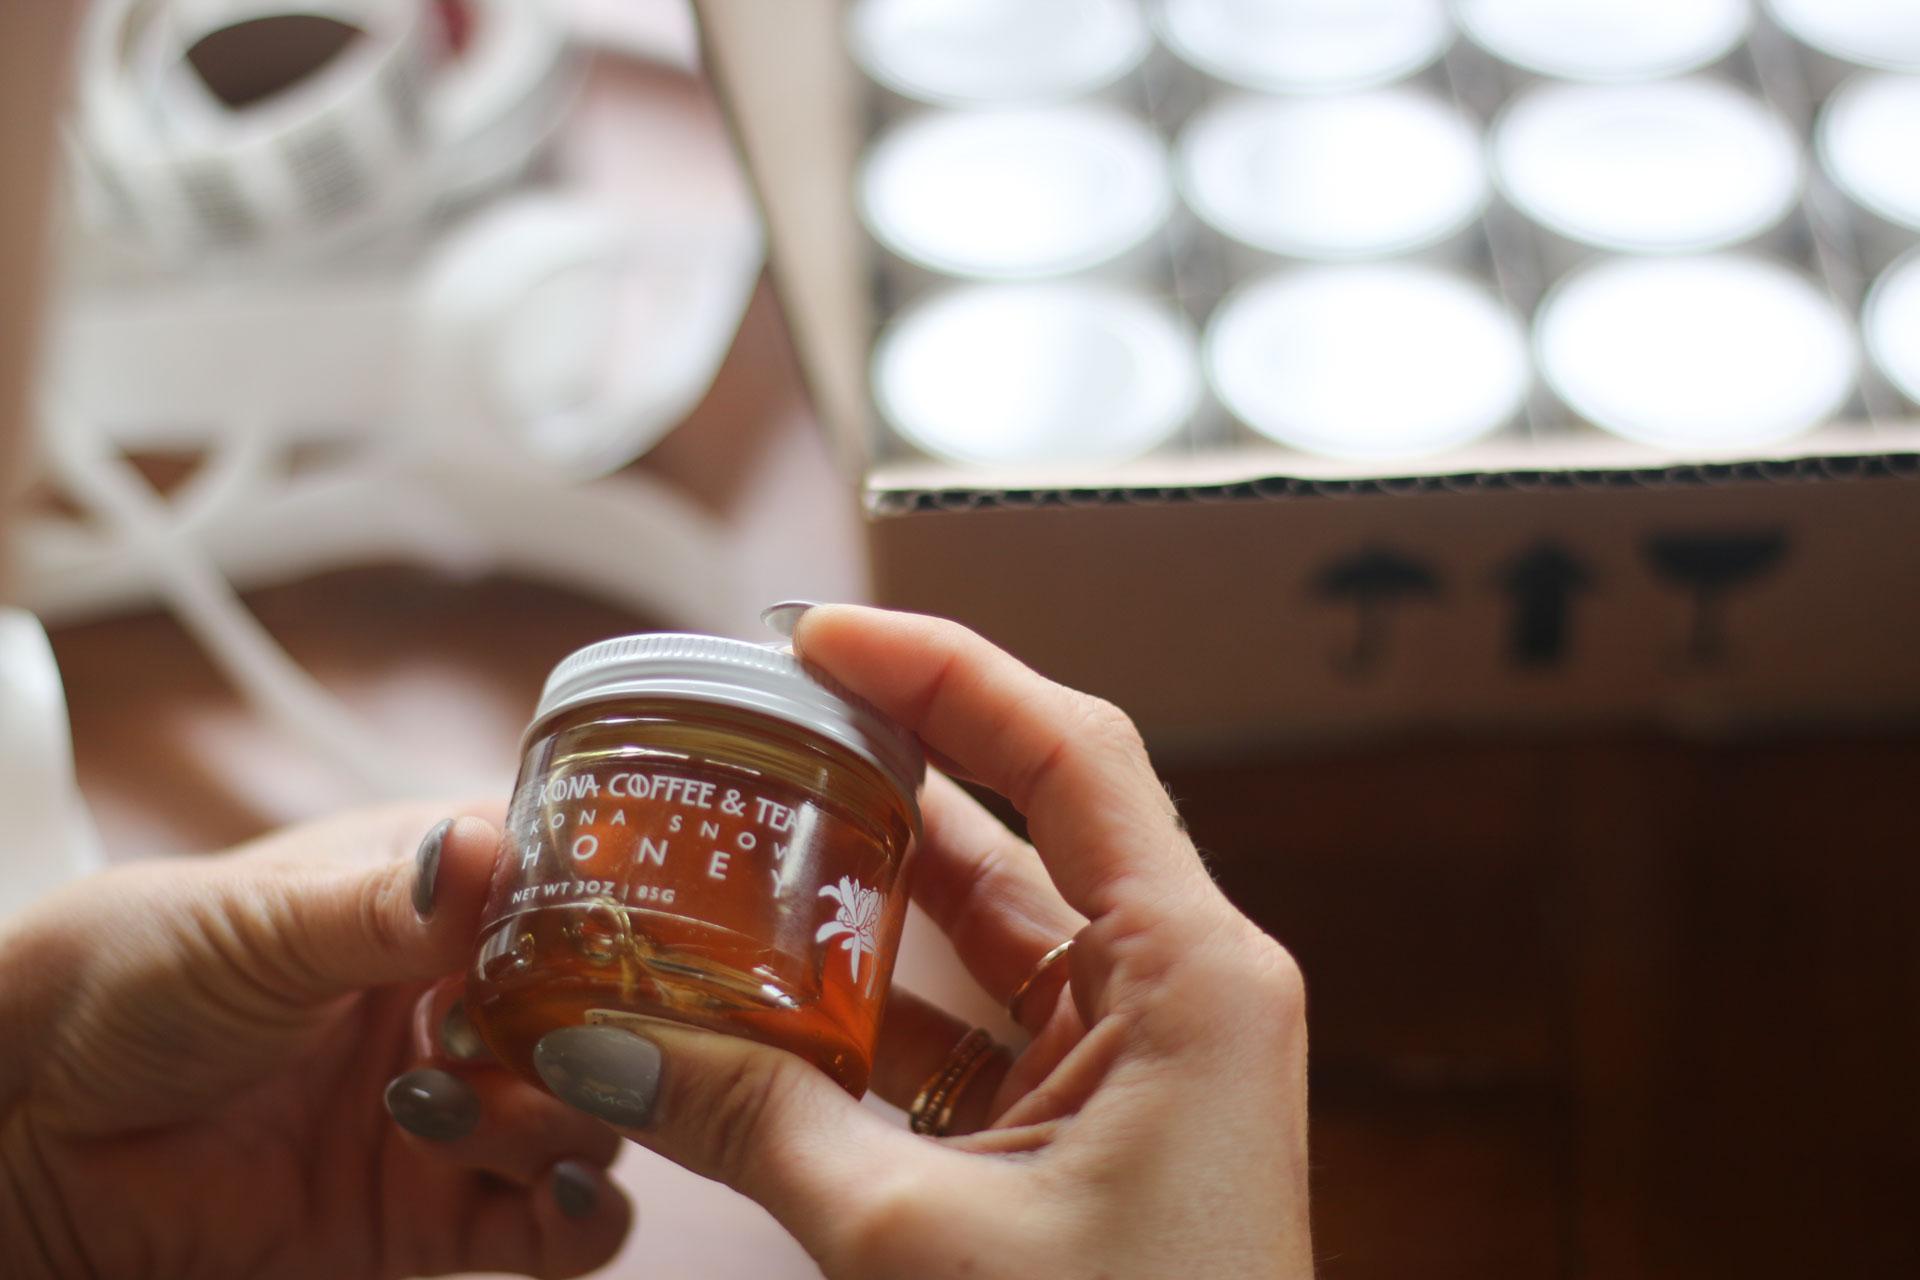 Holding Kona Snow Honey.jpg